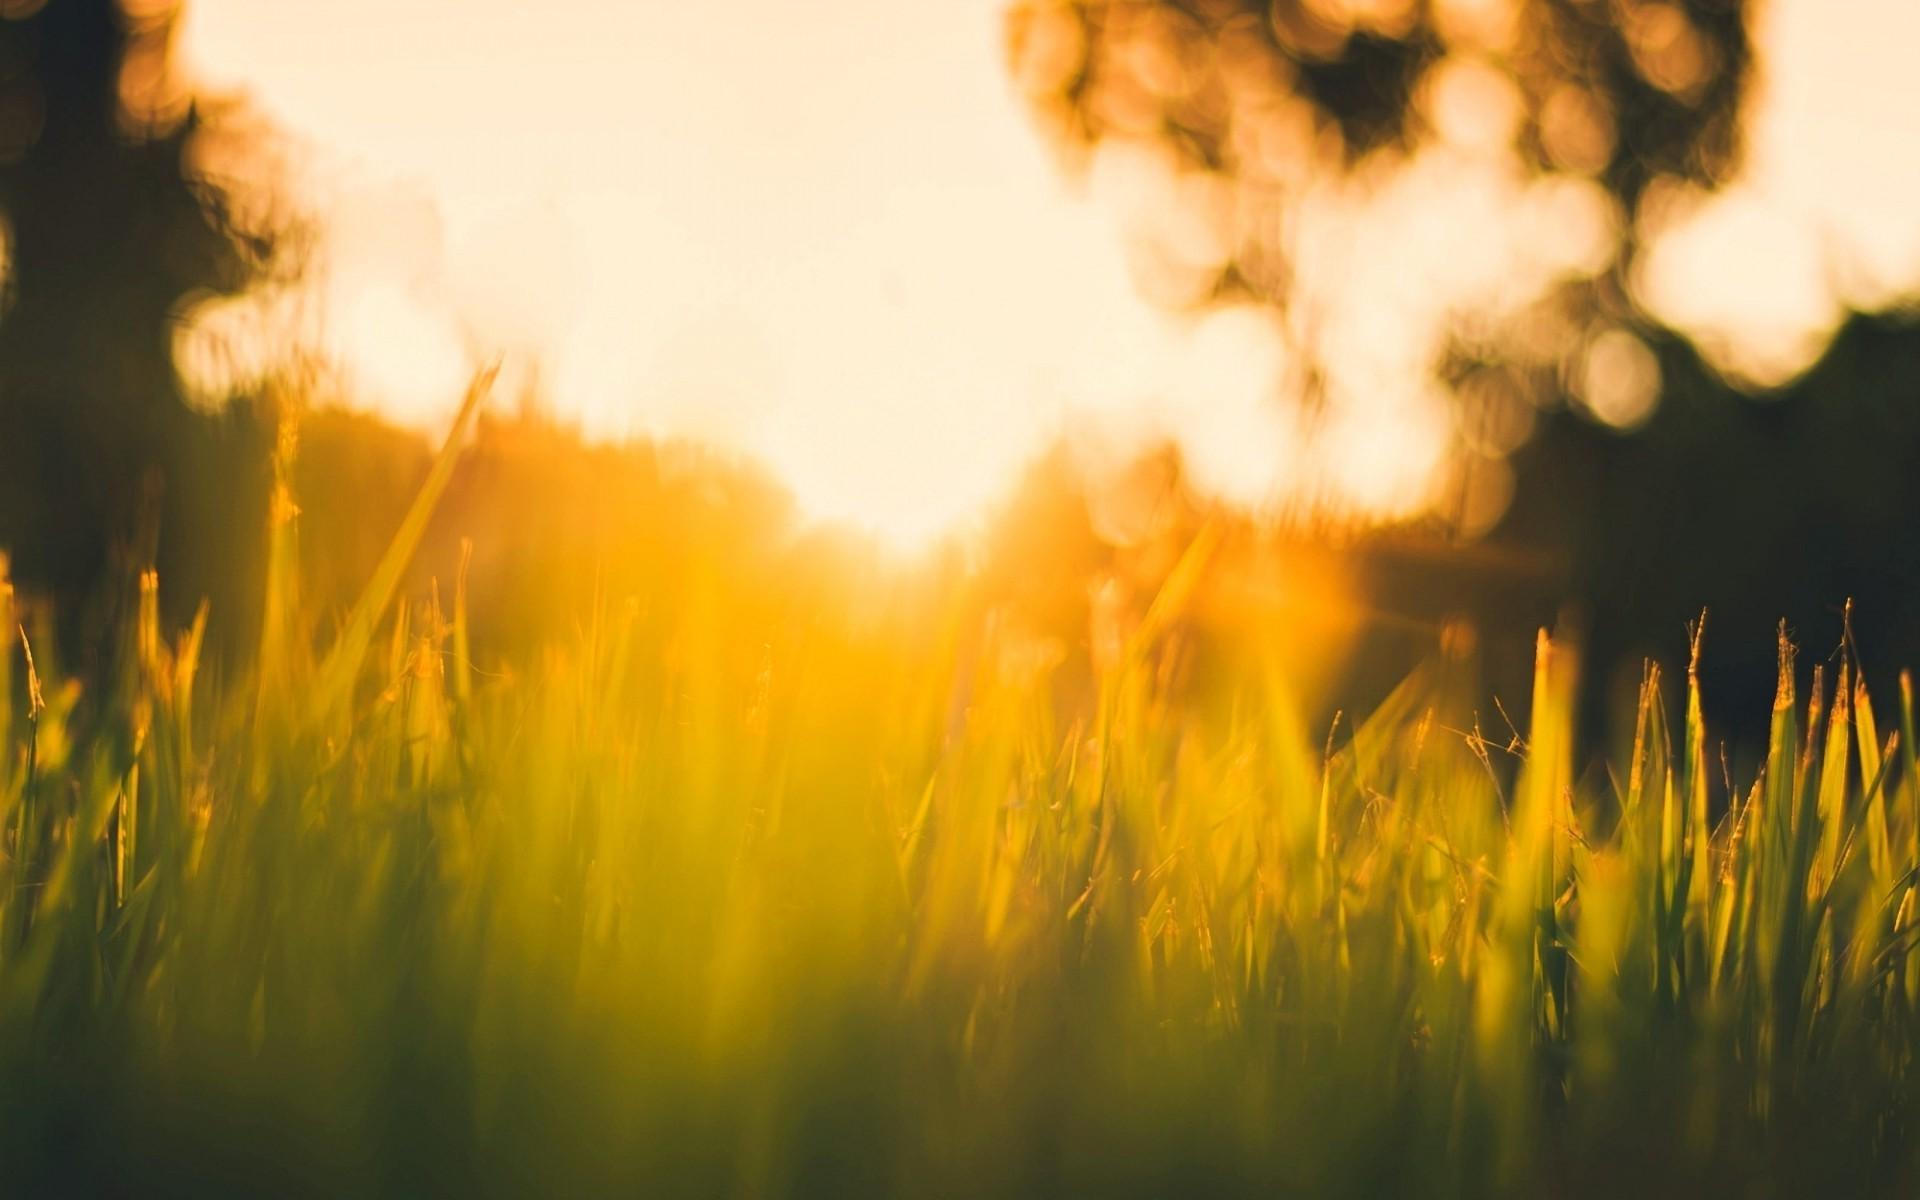 одних лучи солнца на траве картинки одна семья купила